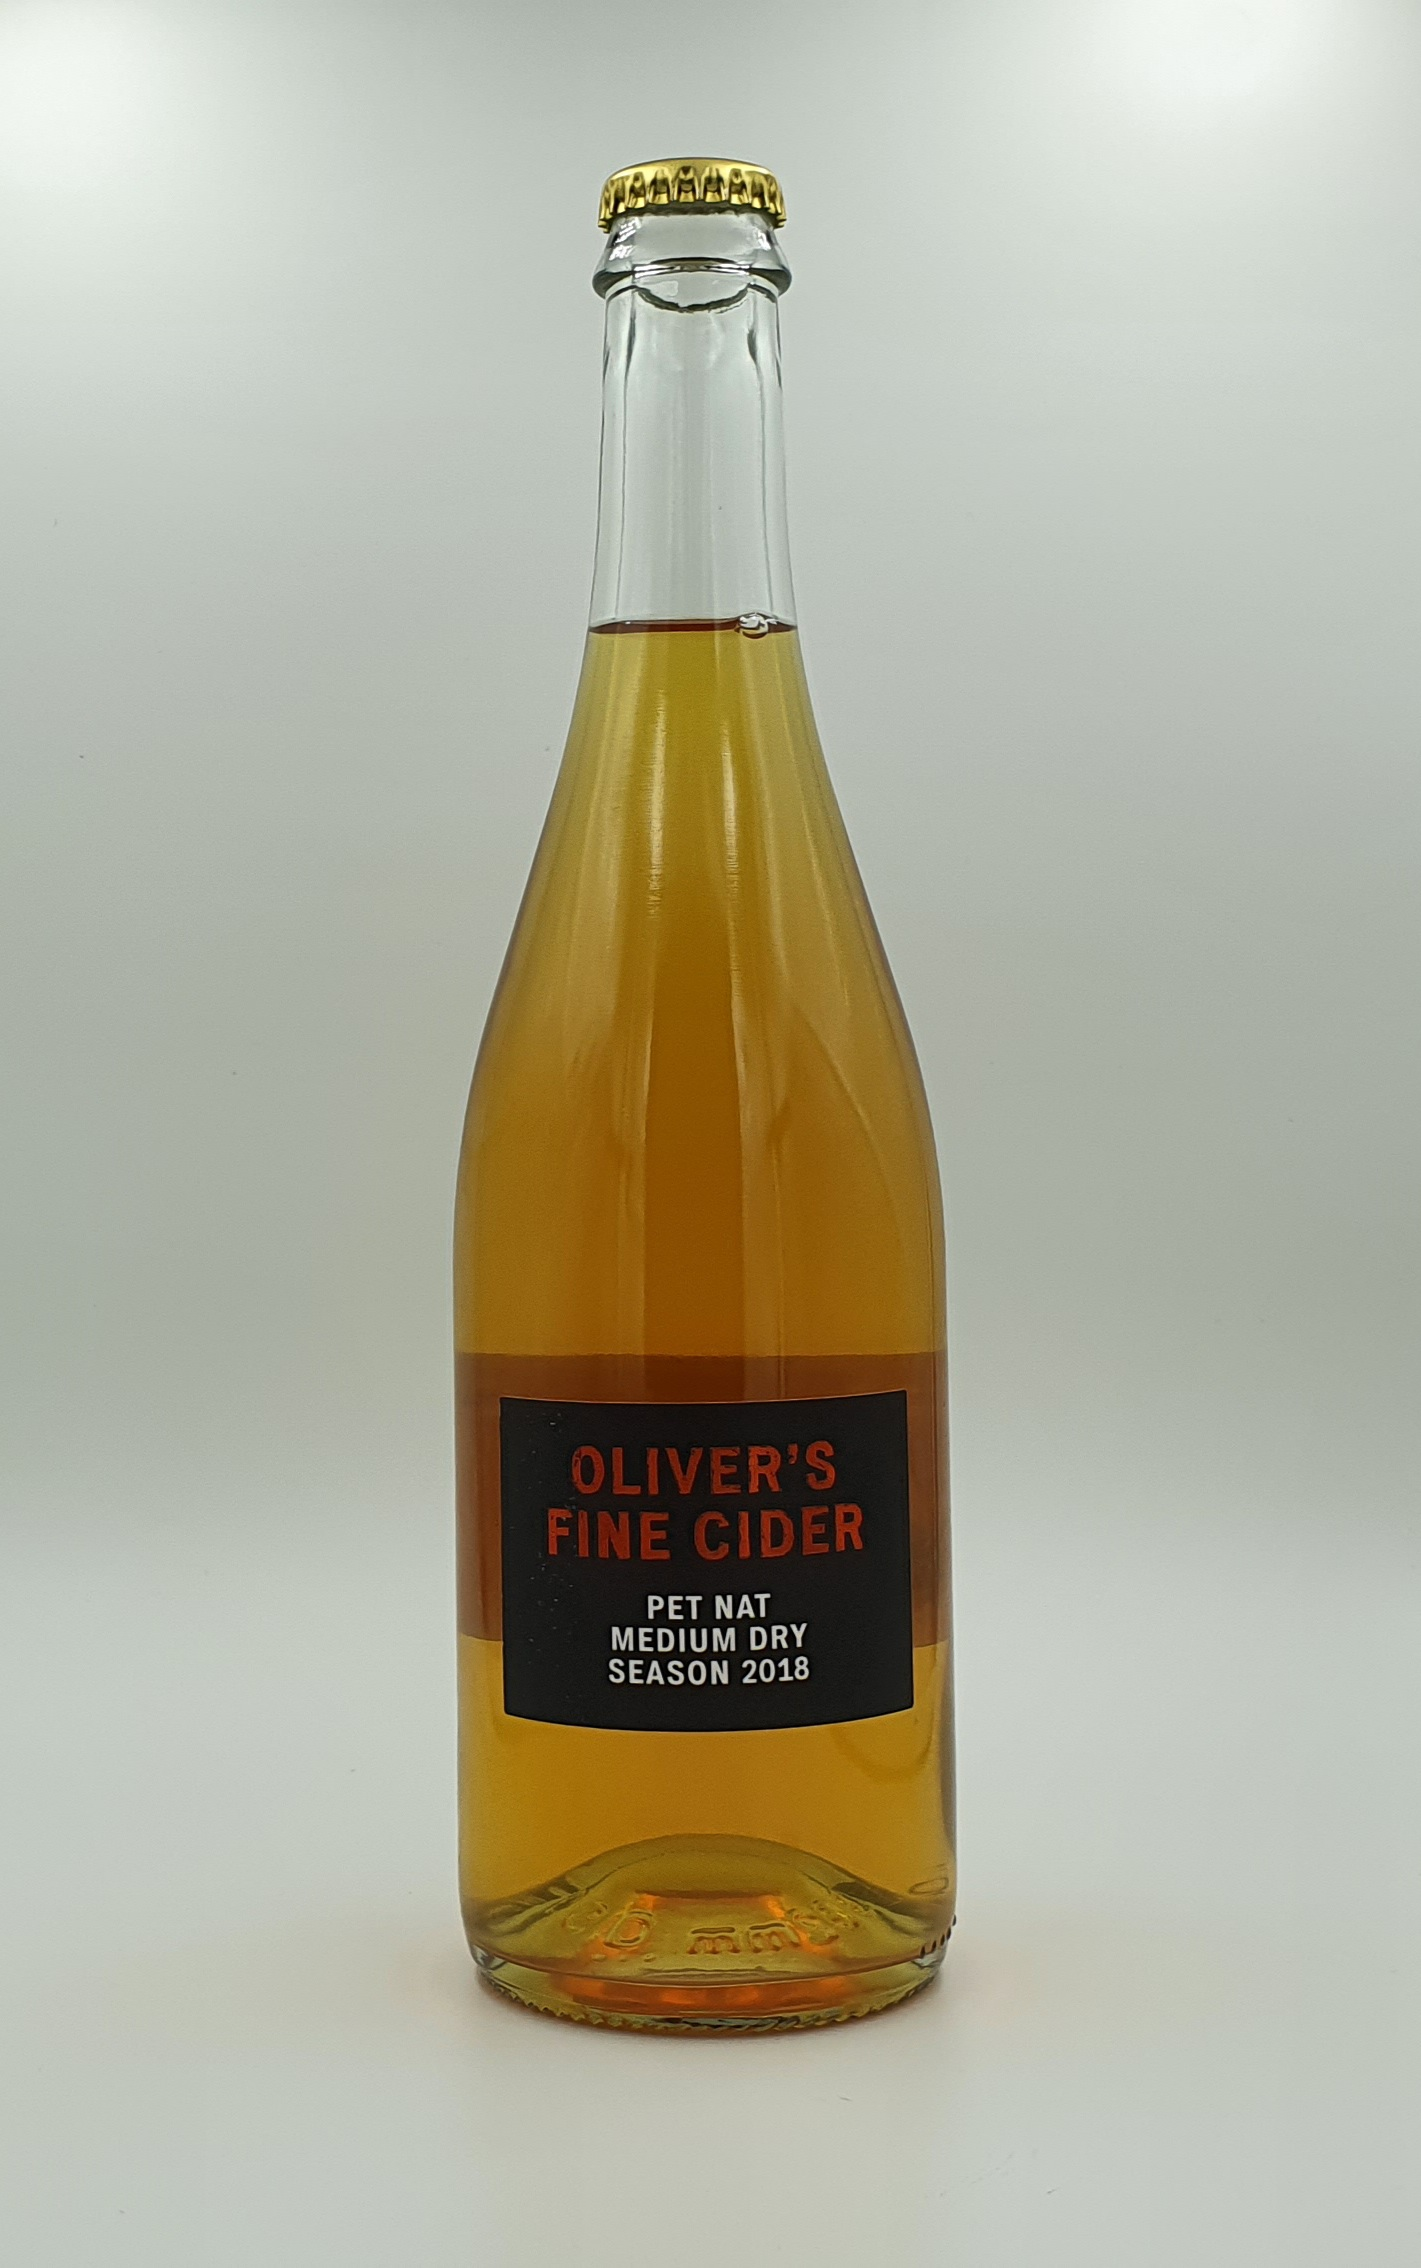 Oliver's Fine Cider Pet Nat Medium Dry 2018 5.4% (750ml)